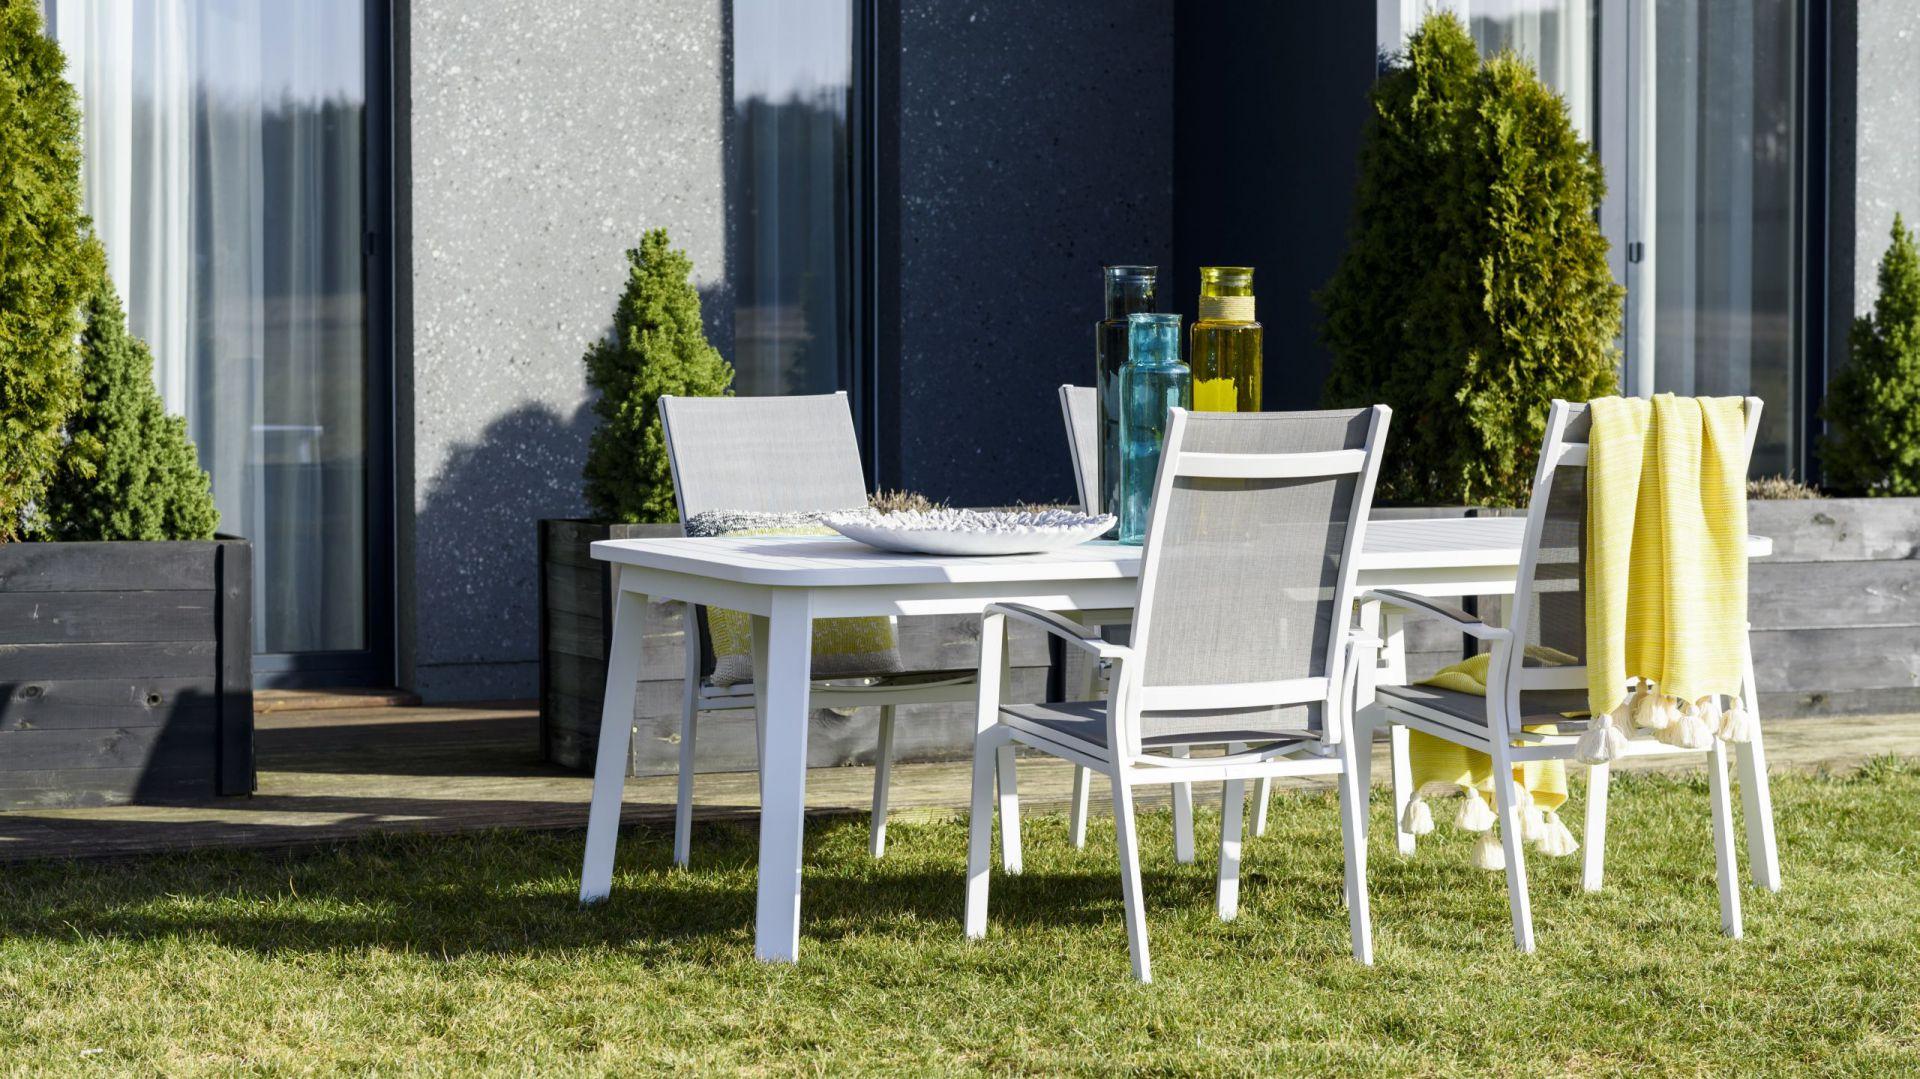 meble ogrodowe laura fot meble do ogrodu na balkon i taras 20 pi knych zestaw w. Black Bedroom Furniture Sets. Home Design Ideas